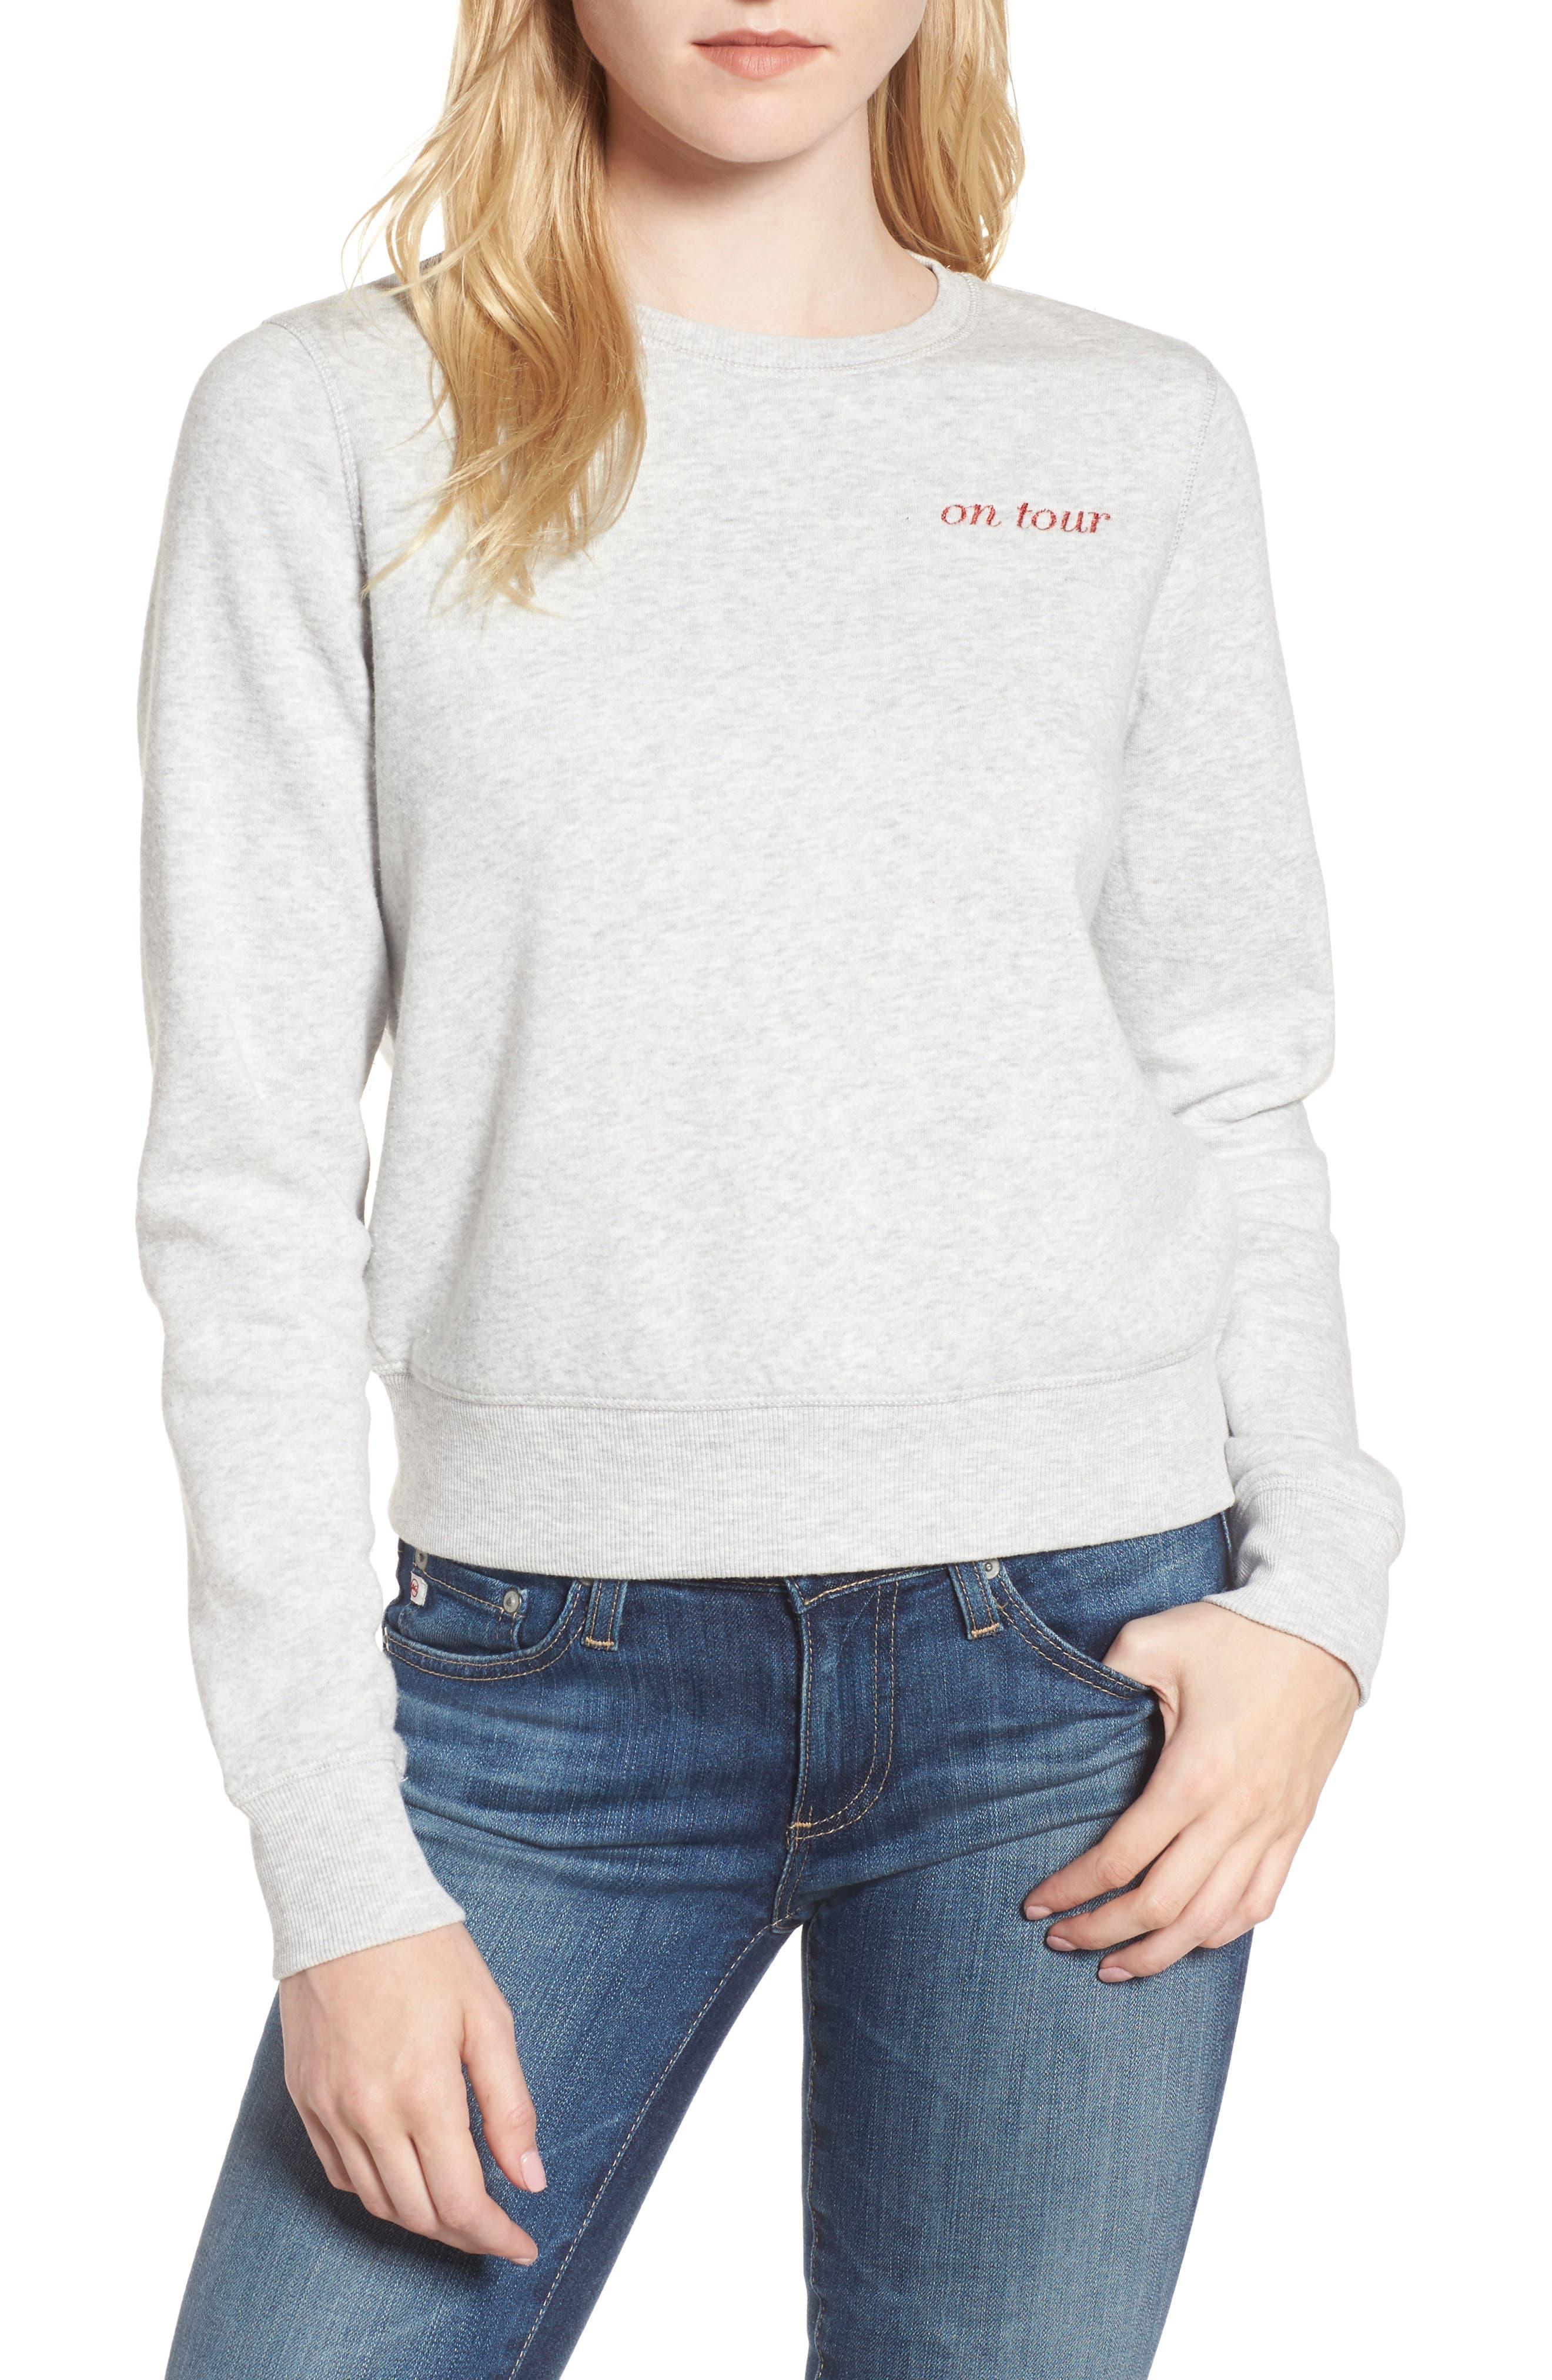 Alternate Image 1 Selected - Rebecca Minkoff Kassidy Tour Sweatshirt